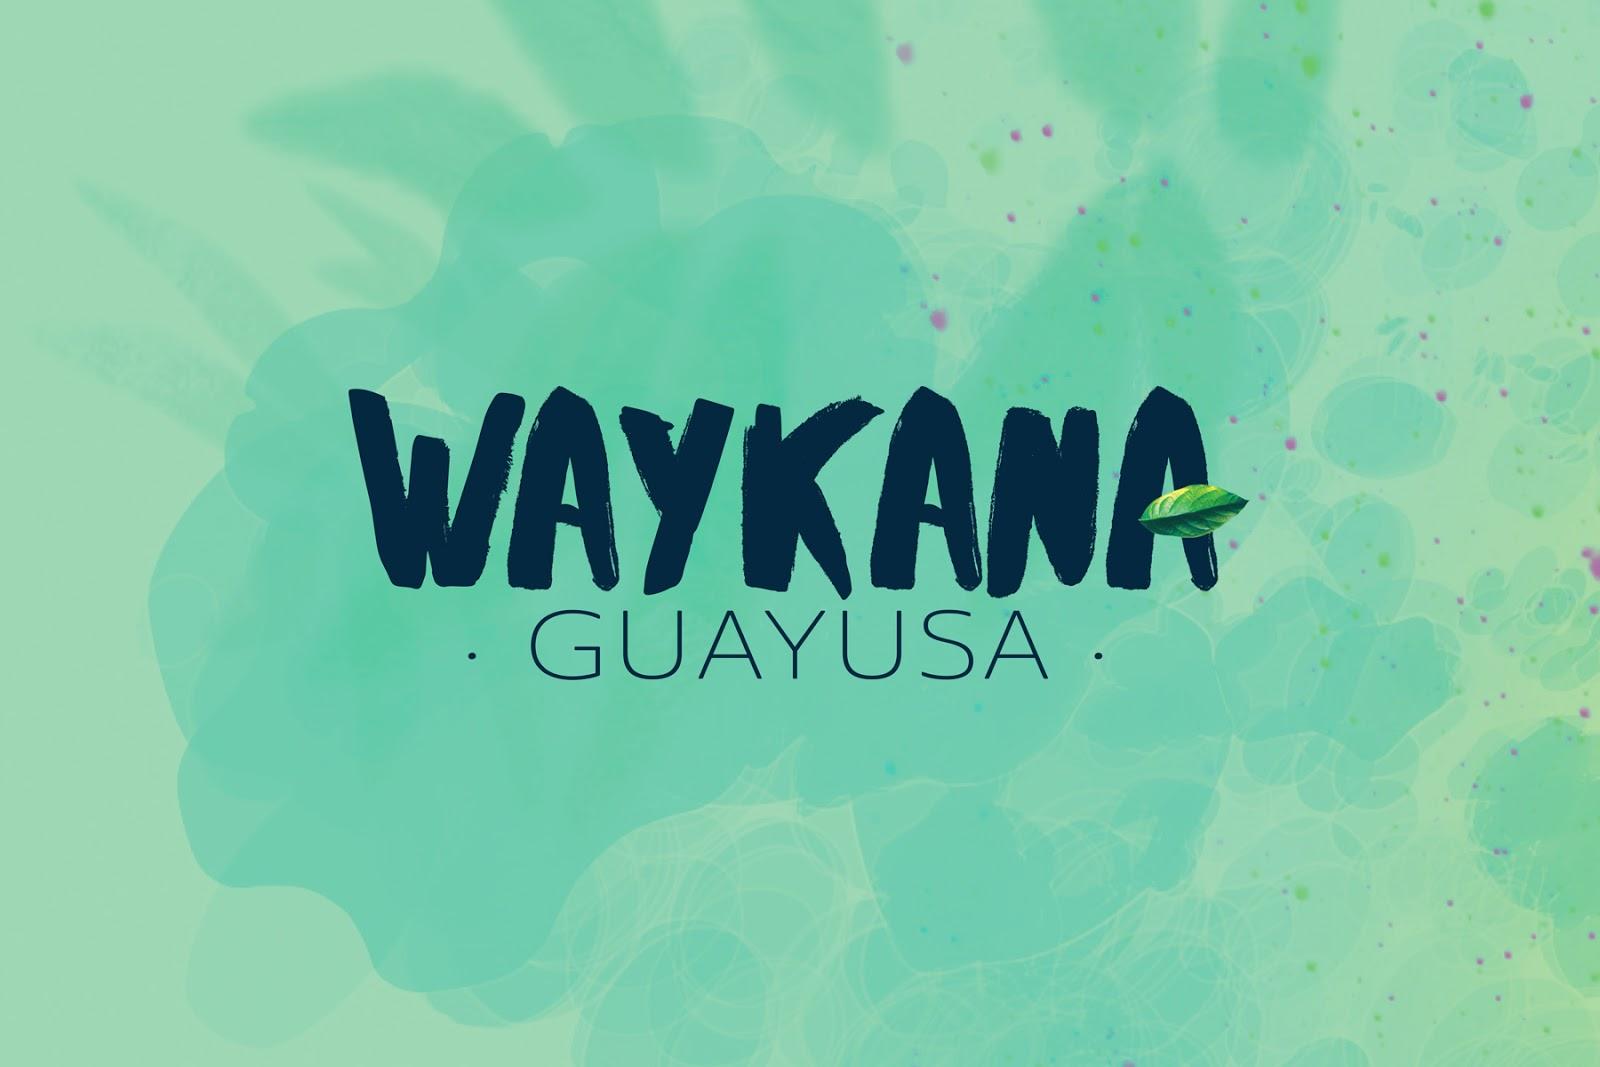 Waykana Guayusa On Packaging Of The World Creative